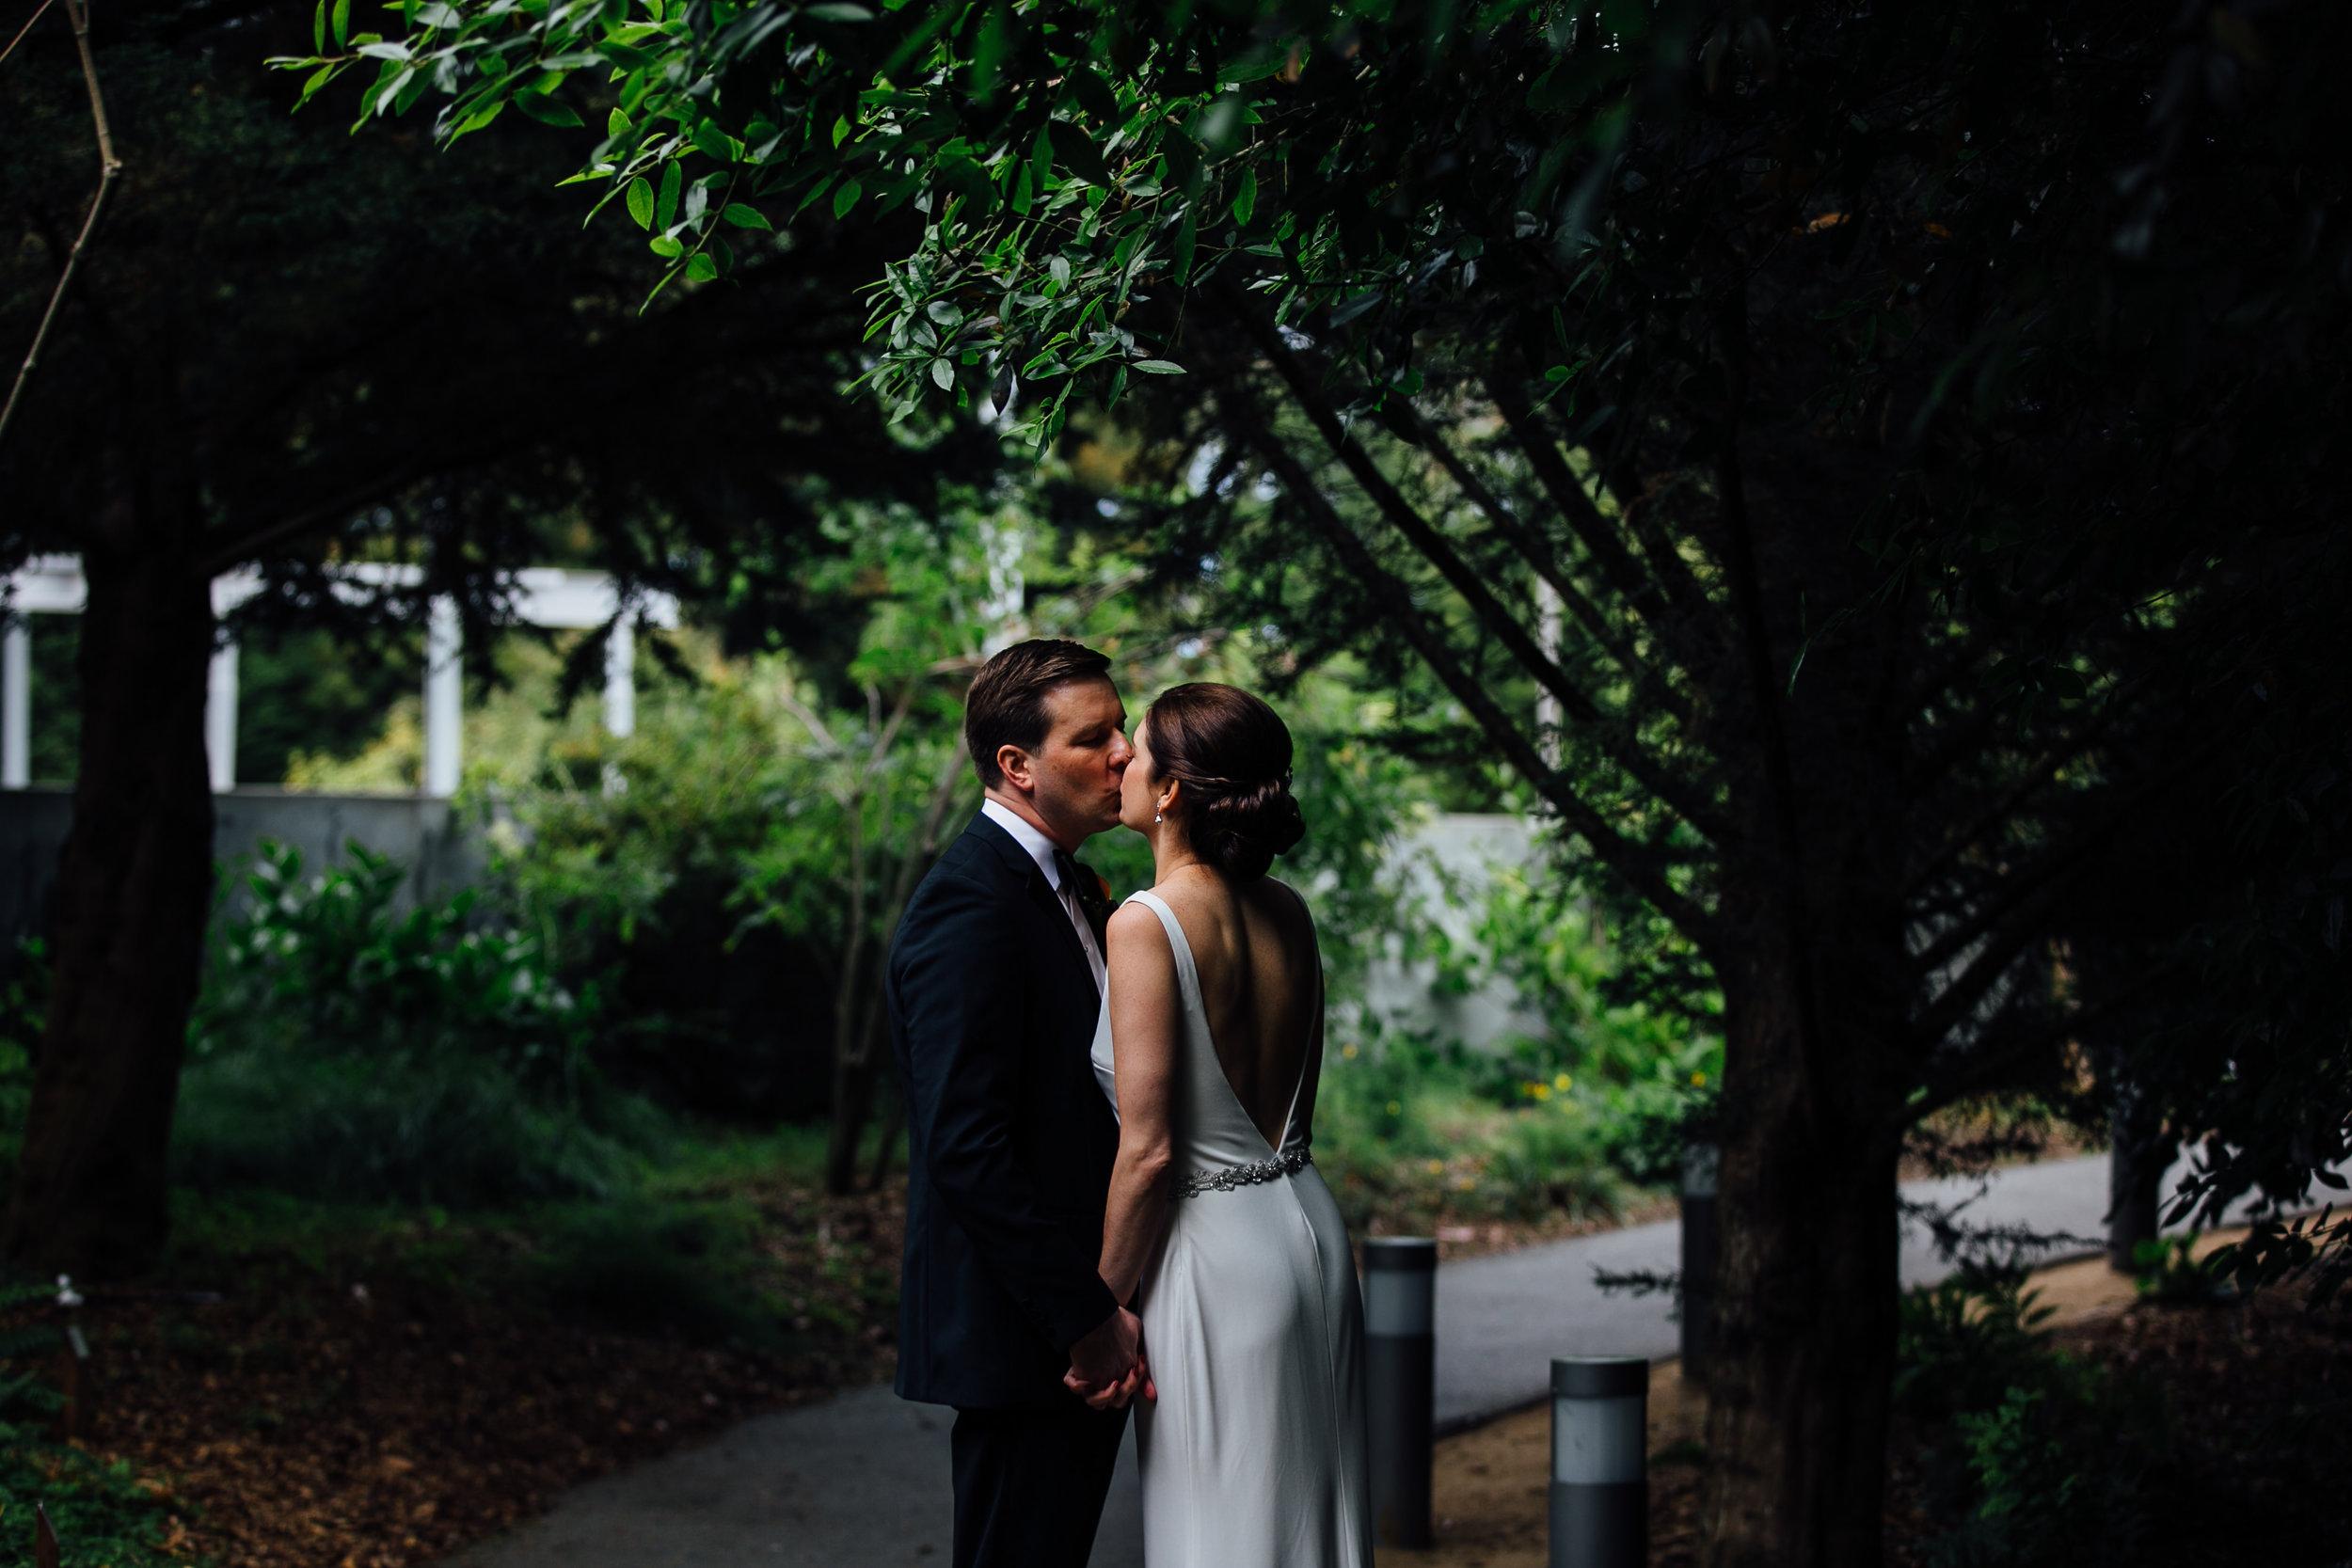 Wedding_KathleenMichael_BG_Portraits-212.jpg